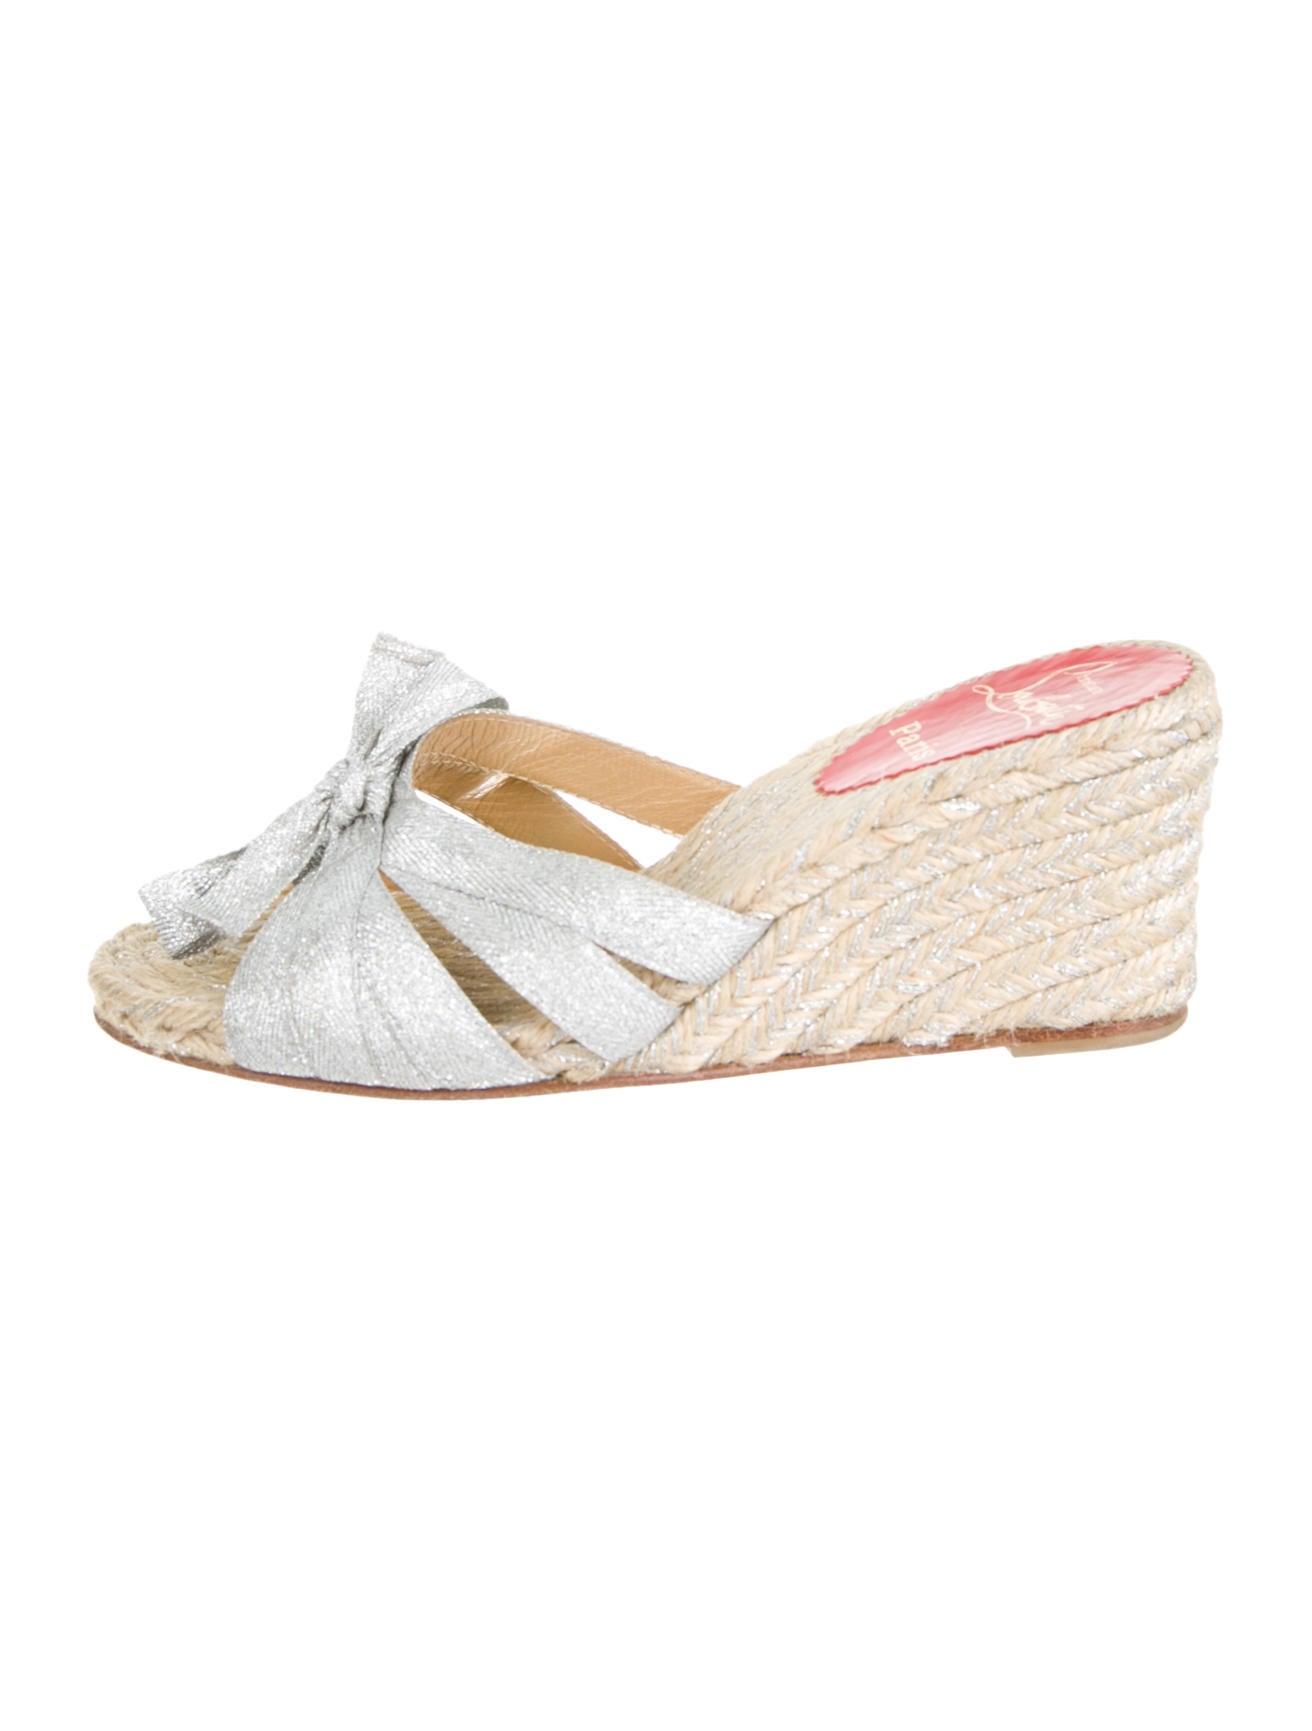 Artesur ? christian louboutin espadrille sandals Metallic silver ...